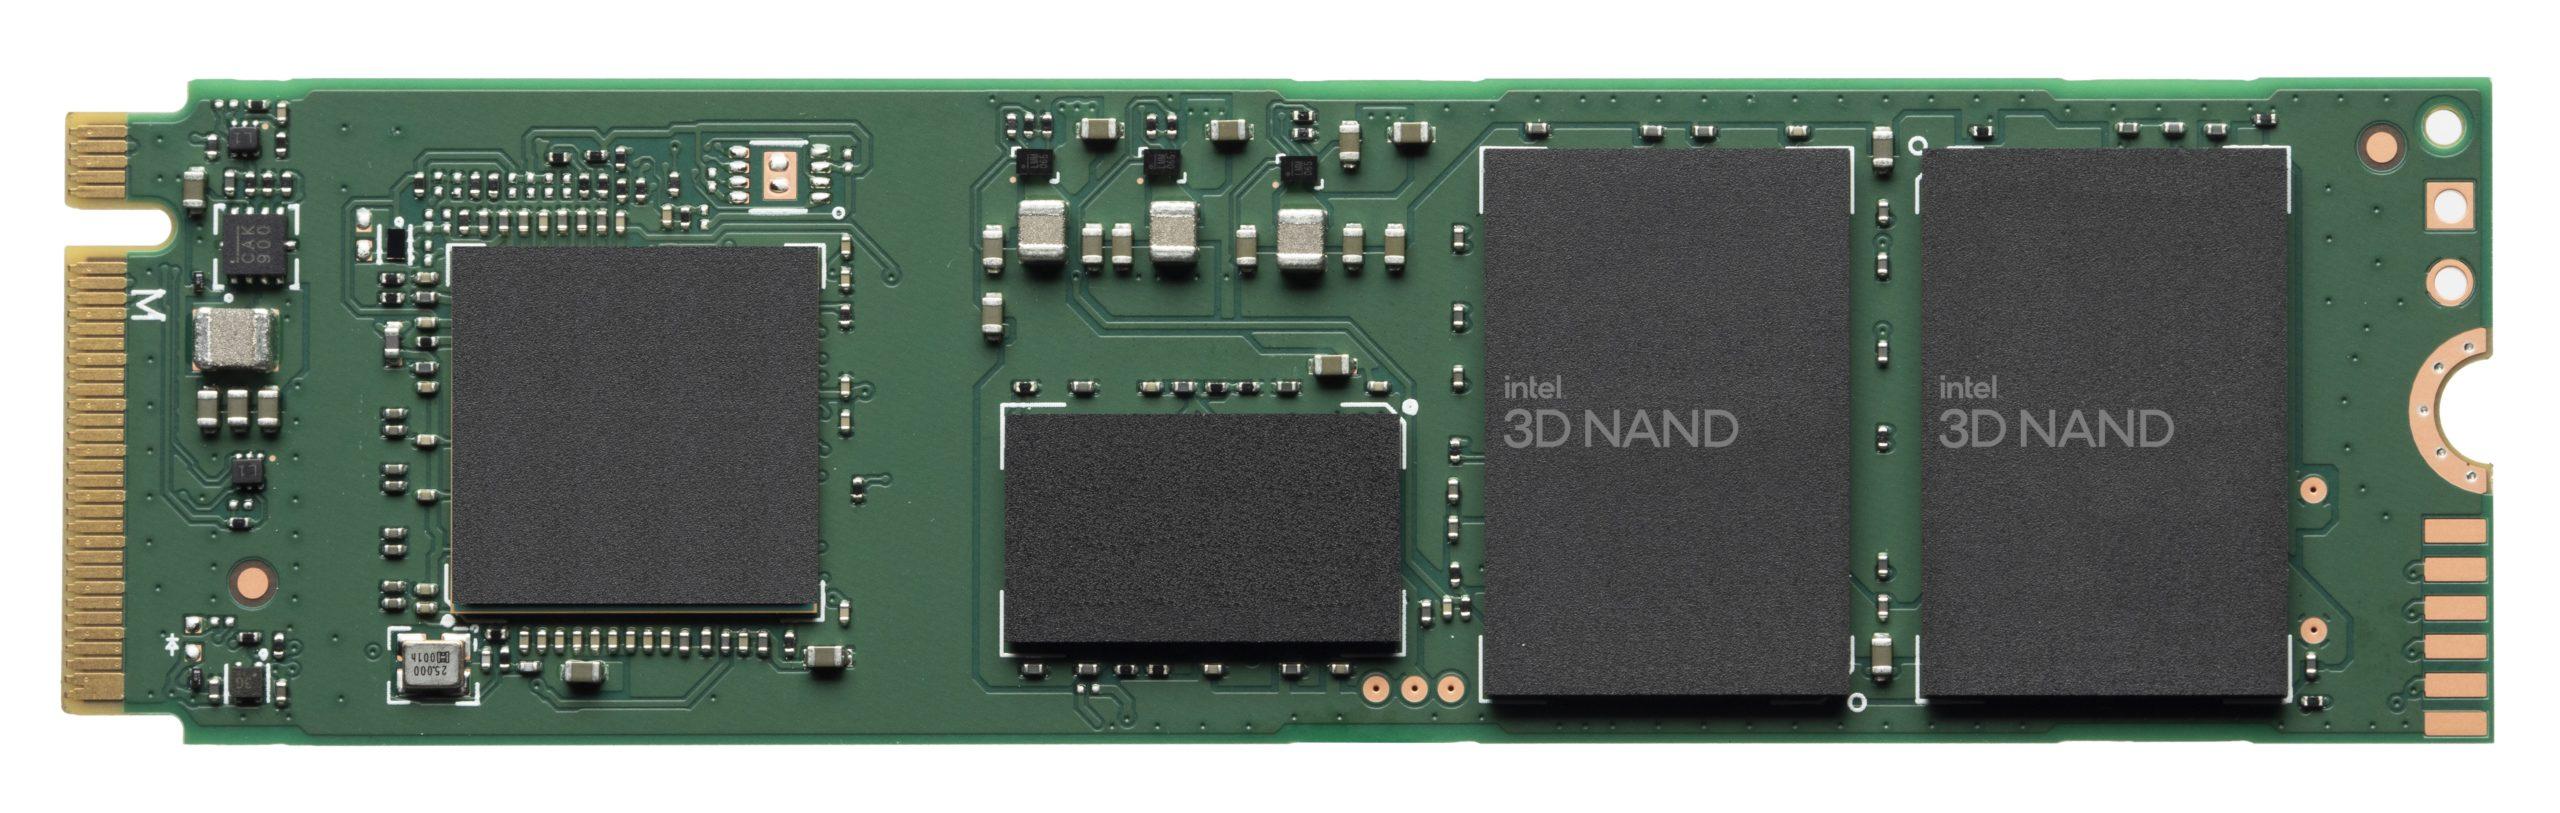 Intel-SSD-670p-NAND-3